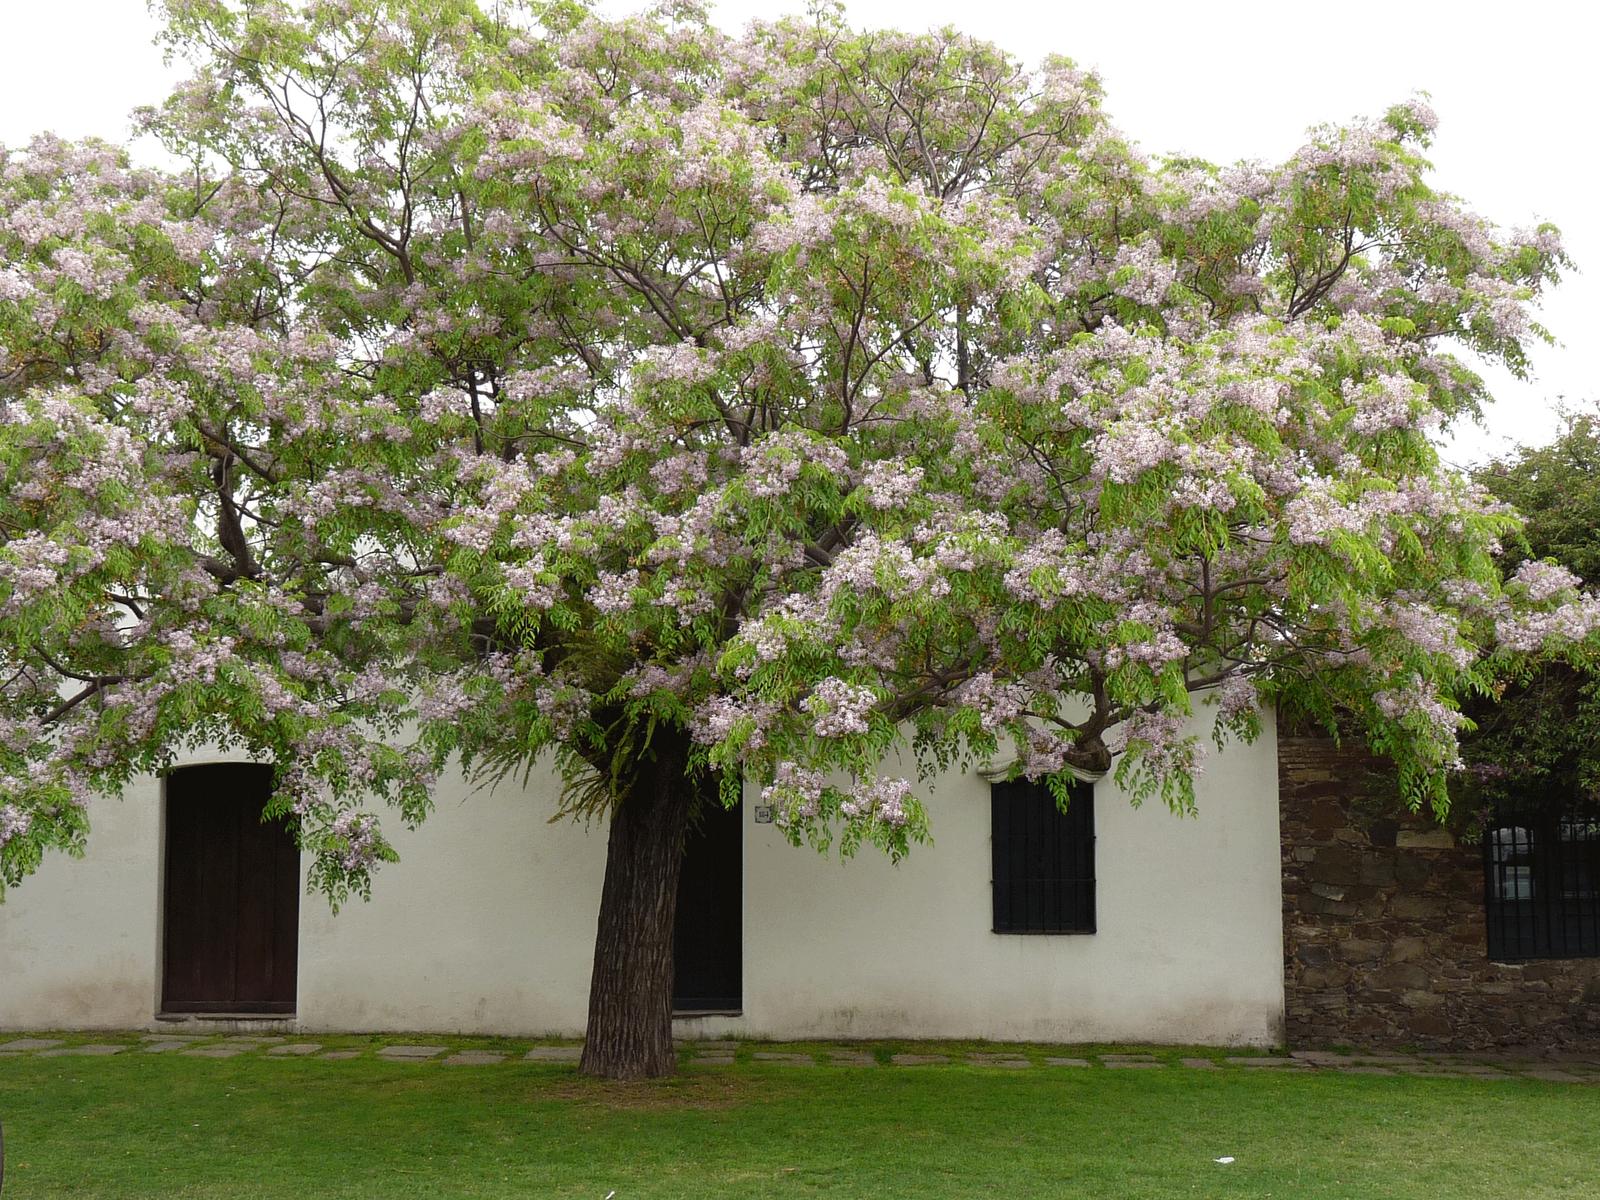 Melia azedarach chinaberry arboles rboles de for Arboles perennes de crecimiento rapido